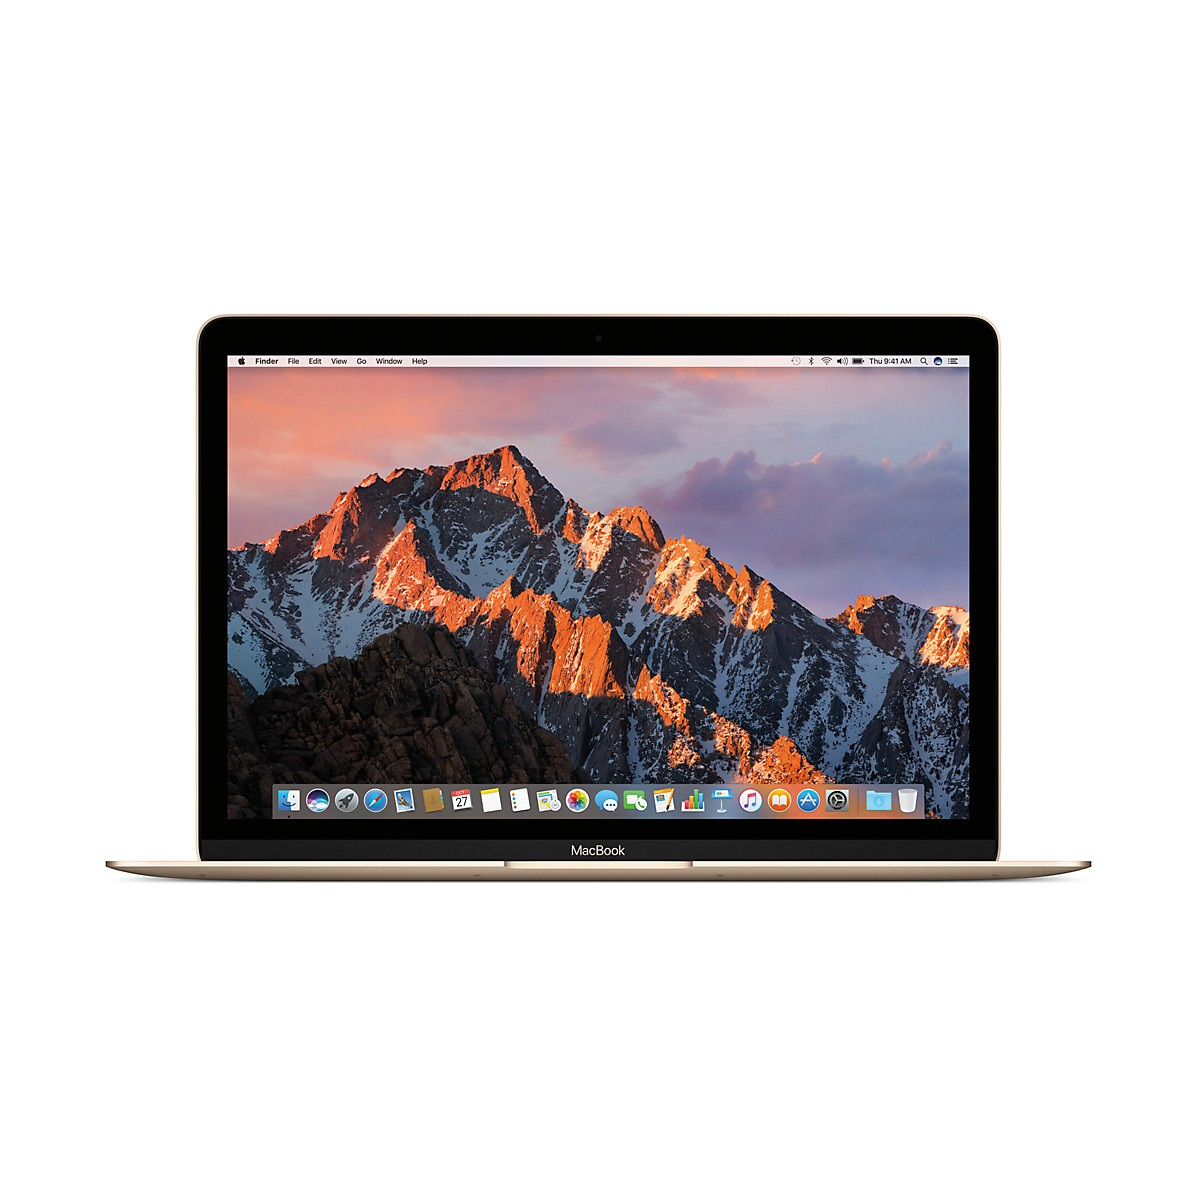 Apple 2017 MacBook 12 in. Core m3 1.2GHz 8GB RAM 256GB SSD Gold (MNYK2LL/A)